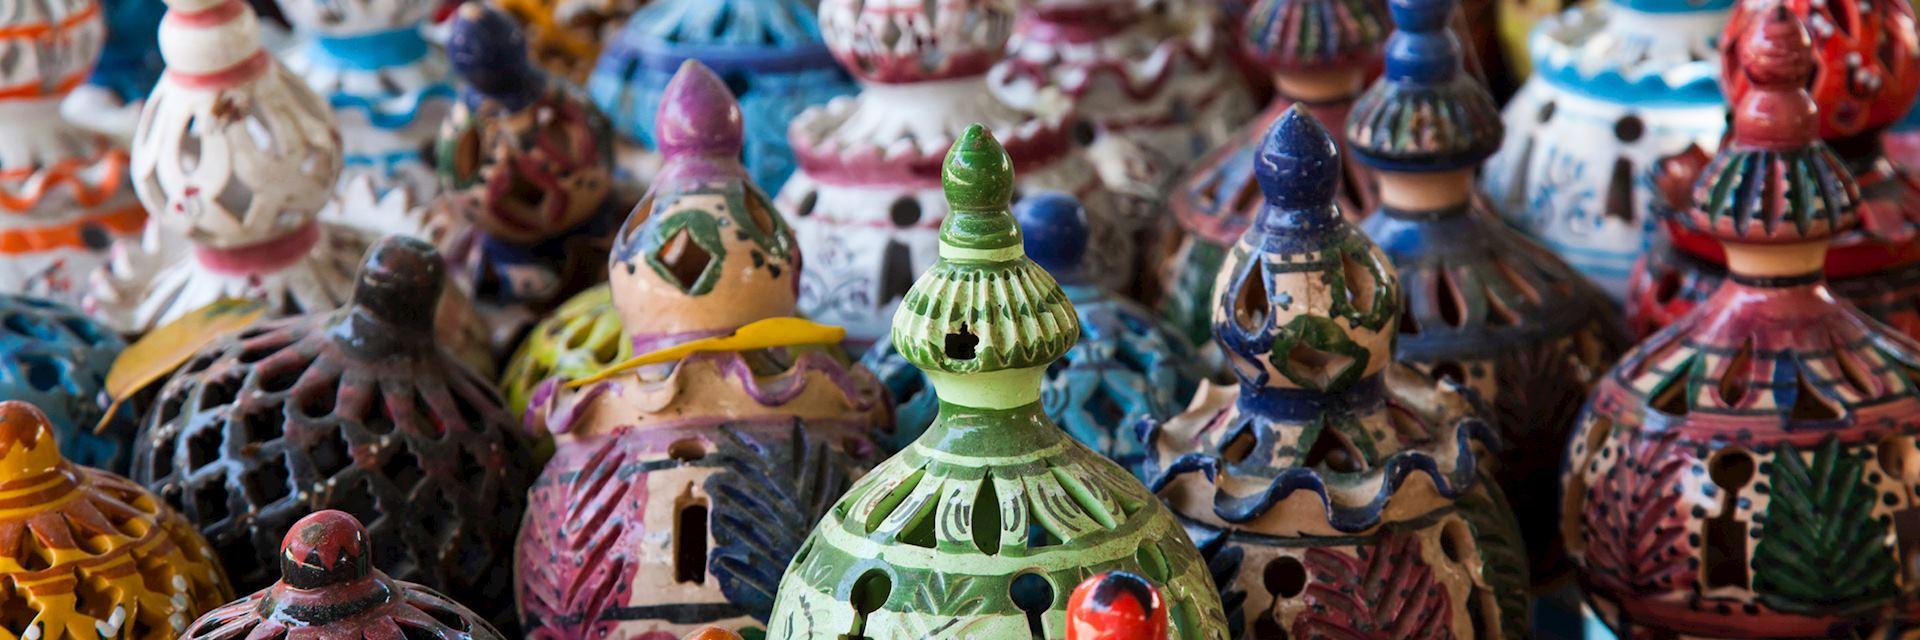 Tunisian lamps in a market, Jerba